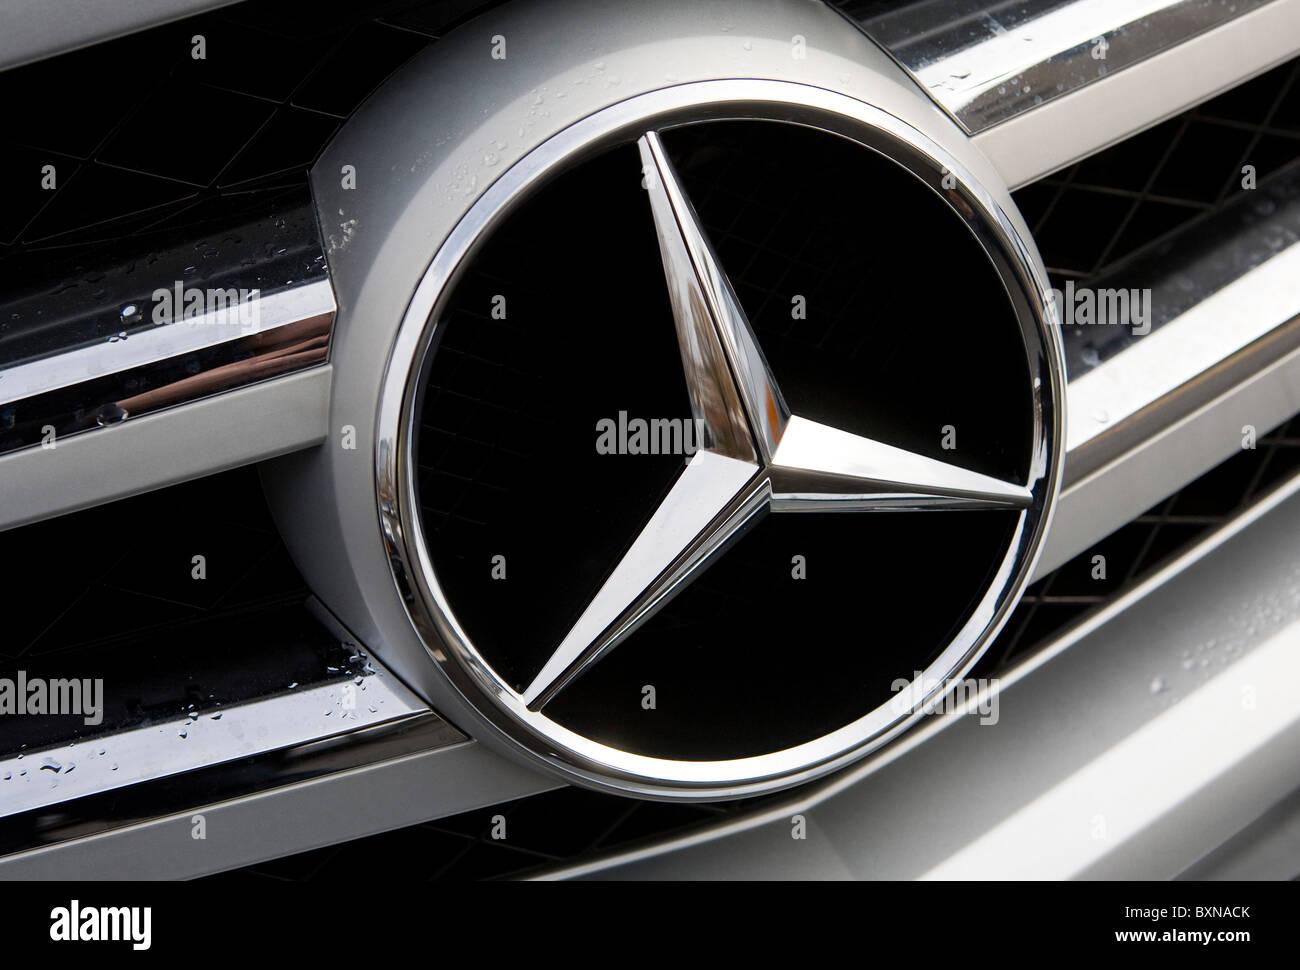 A Mercedes- Benz car dealership.  - Stock Image